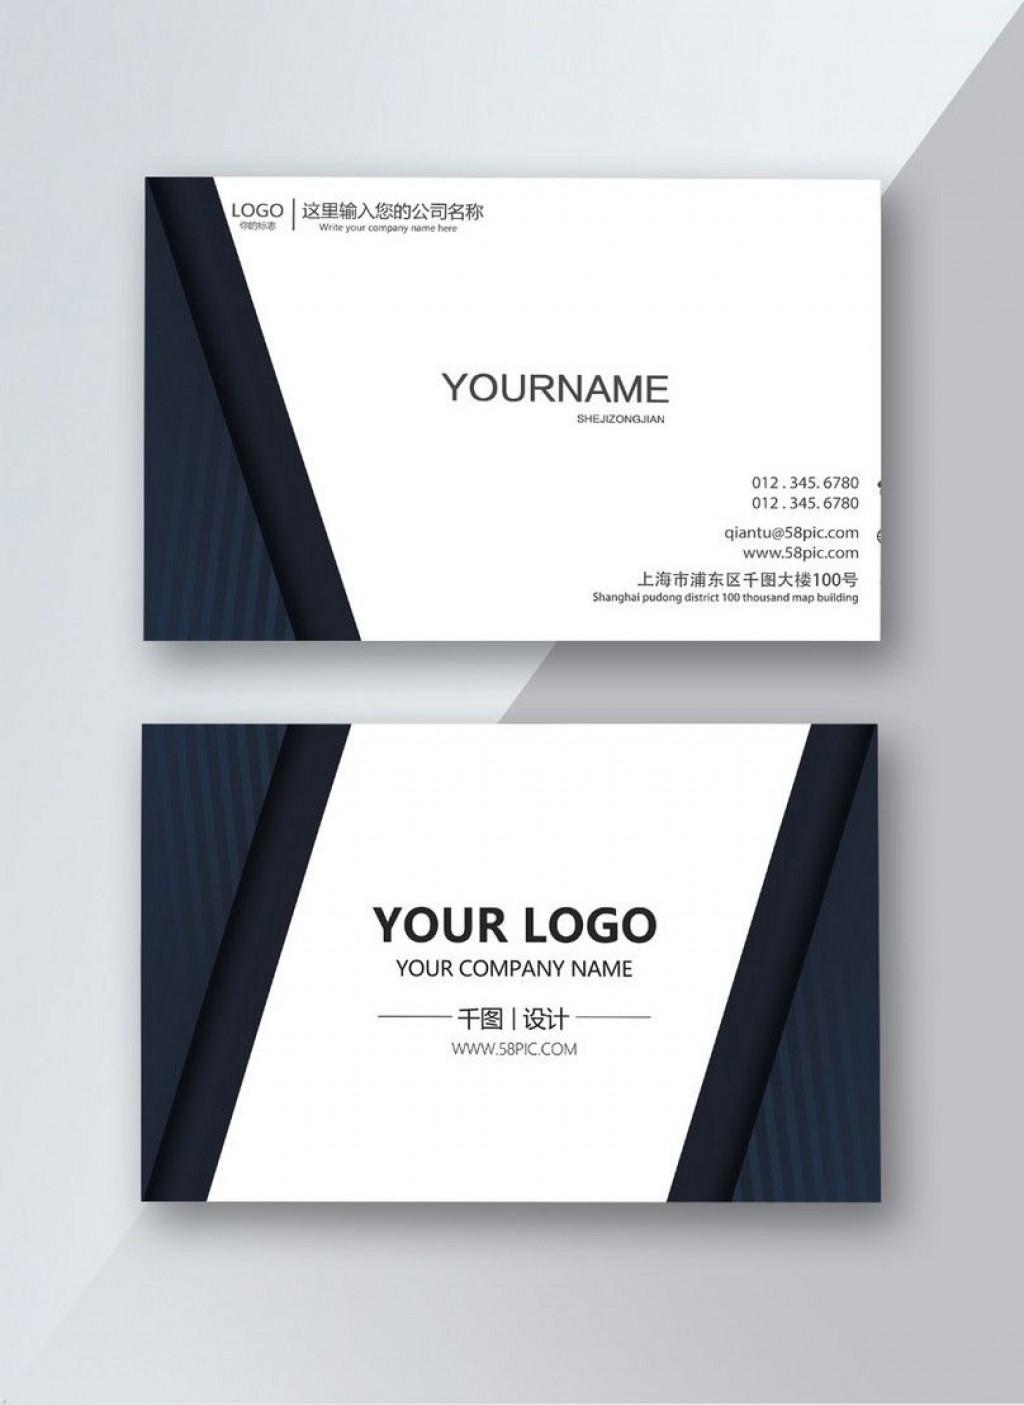 003 Unbelievable Folding Busines Card Template Image  Folded Photoshop Ai FreeLarge